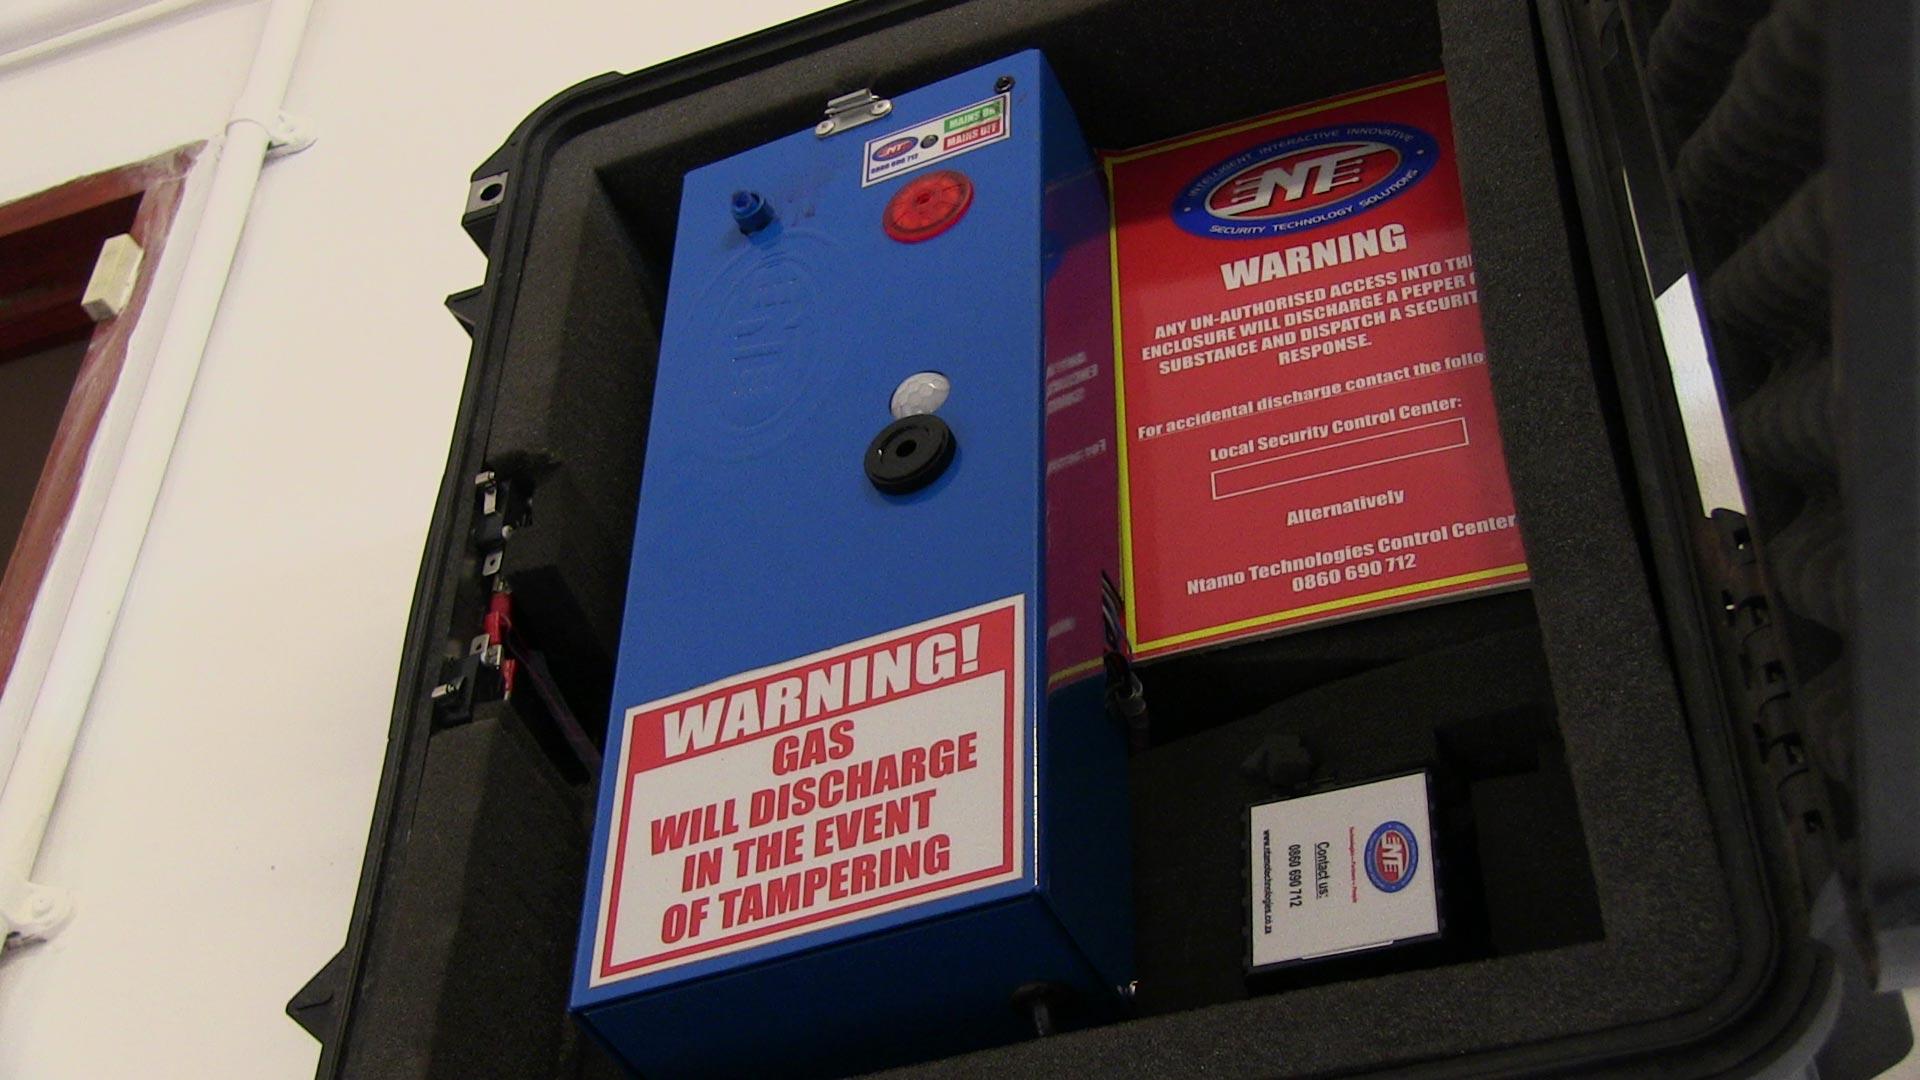 Pepper Gas Alarm, This Device sprays pepper gas or marking spray.